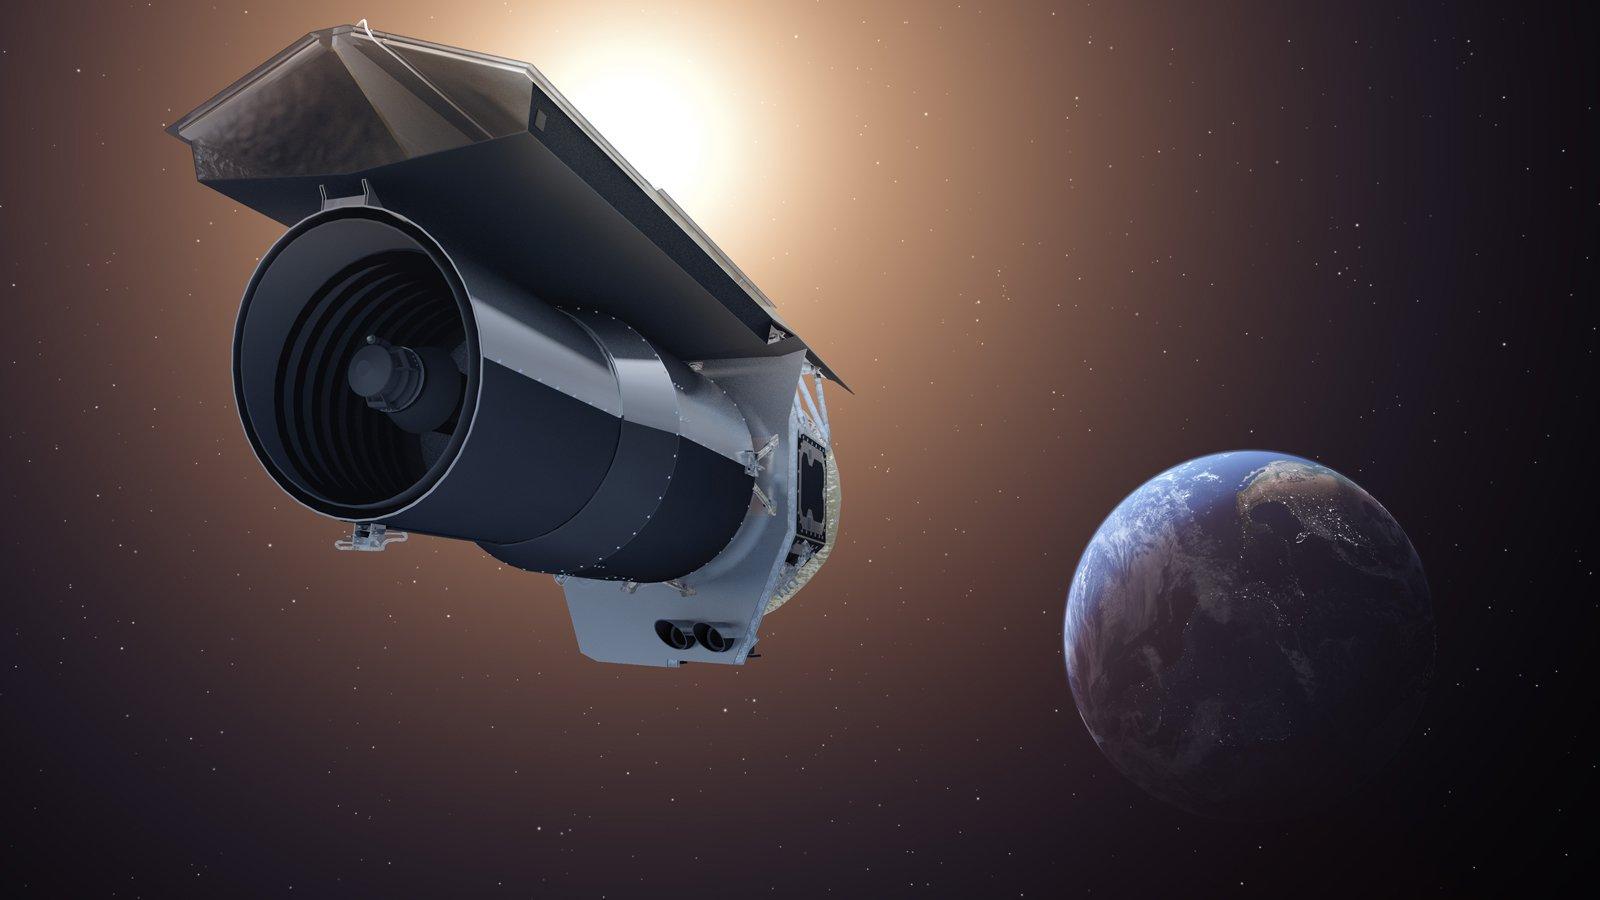 NASA's Spitzer Space Telescope. Credit: NASA/JPL-Caltech